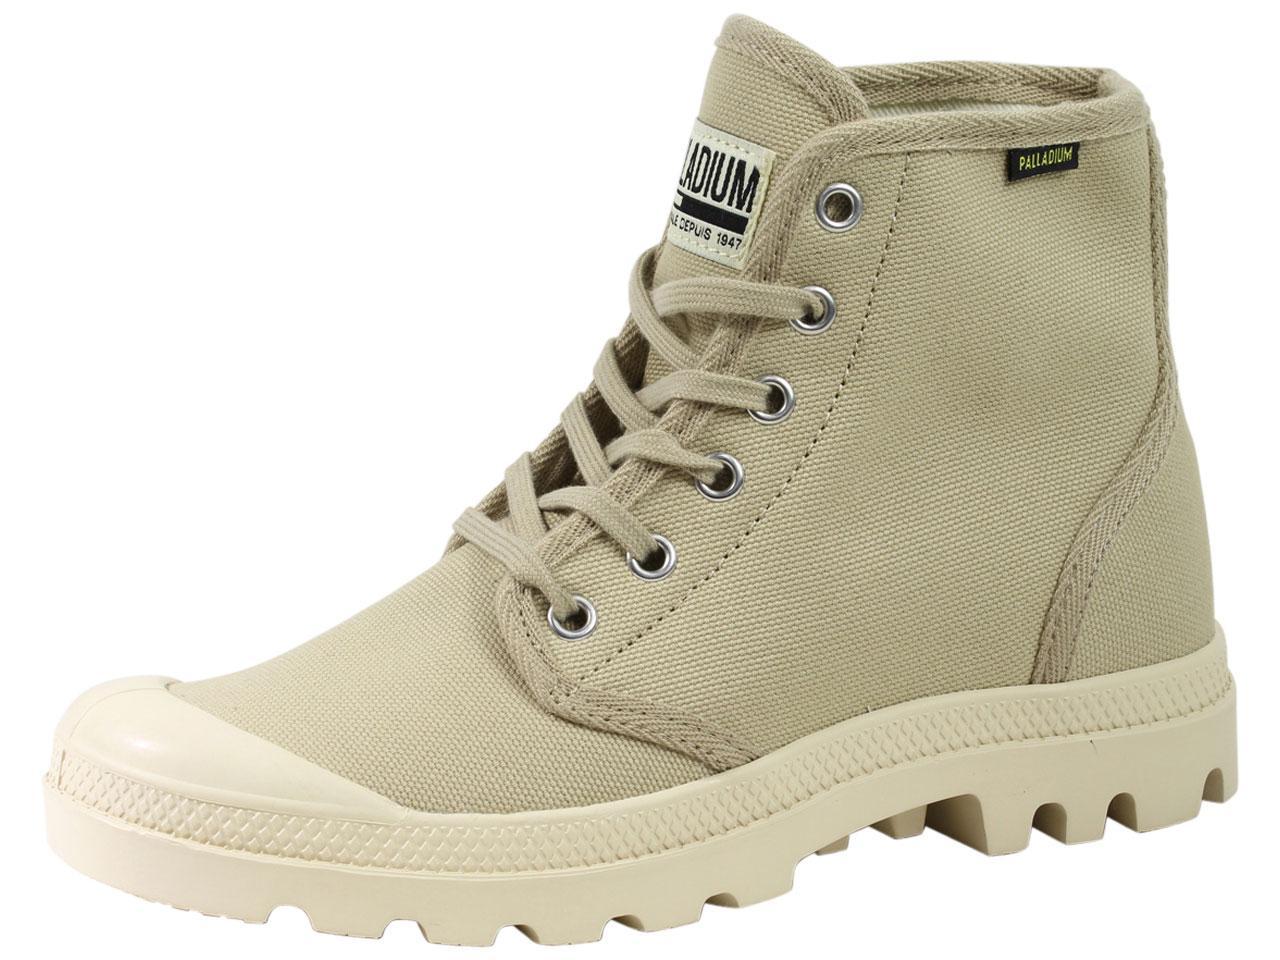 Image of Palladium Men's Pampa Hi Originale Chukka Boots Shoes - Beige - 5 D(M) US/6.5 B(M) US